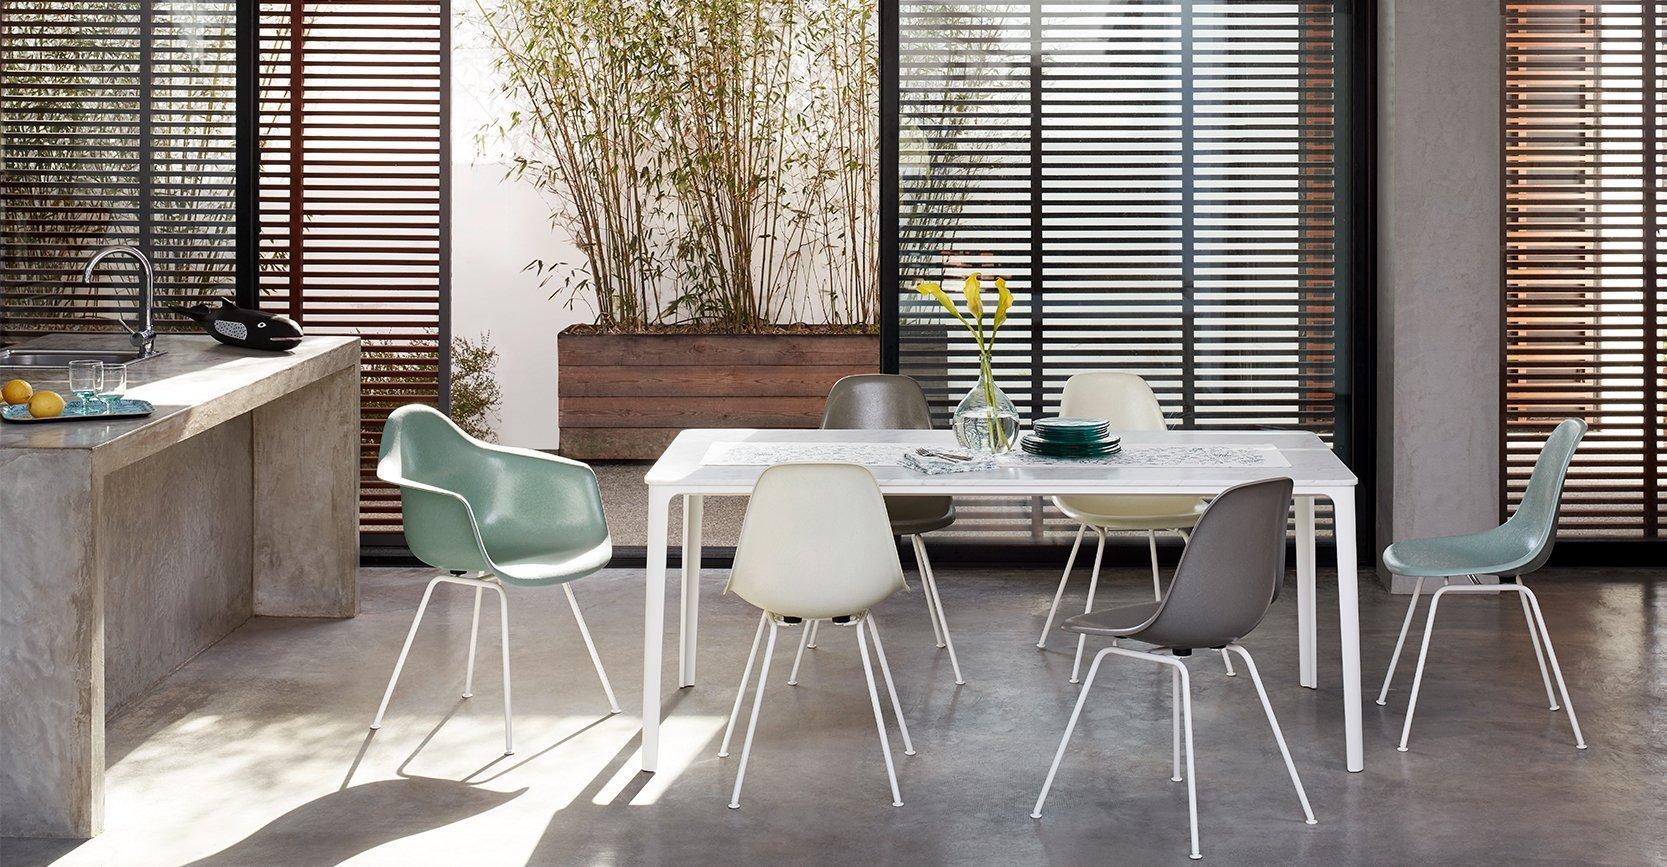 Vitra Eames Fiber en Plastic chairs